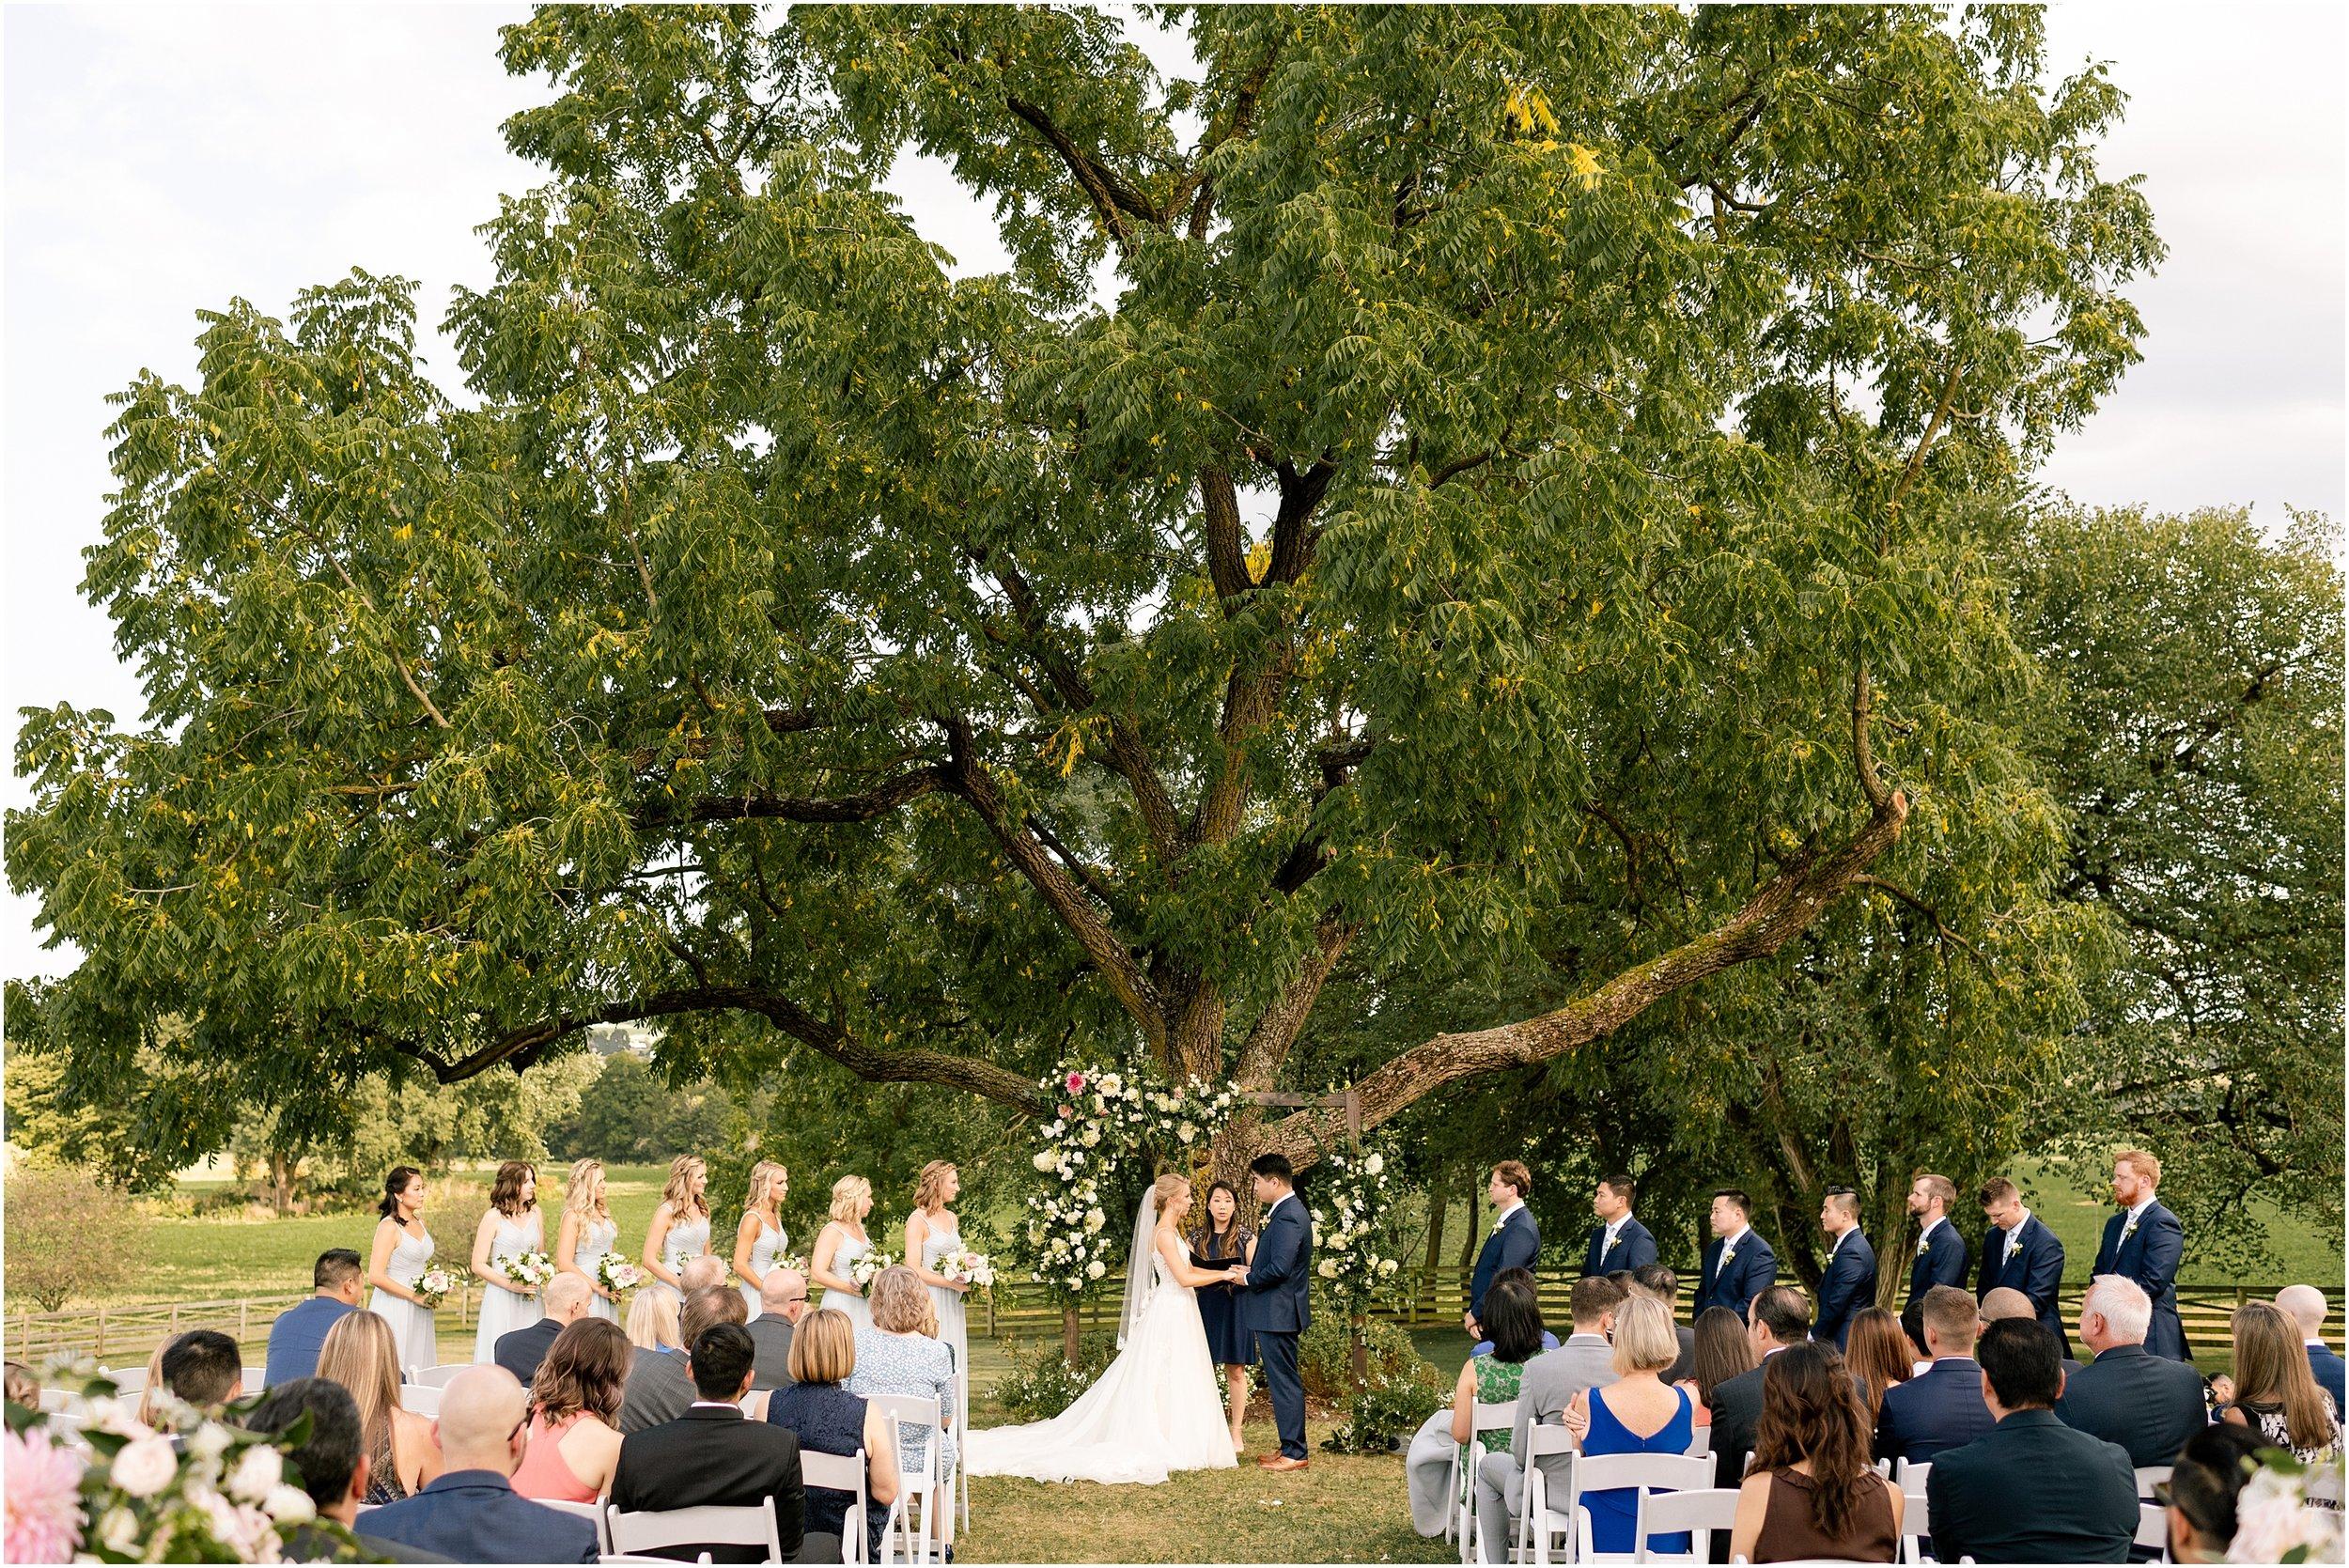 hannah leigh photography Walkers Overlook Wedding Walkersville MD_3535.jpg